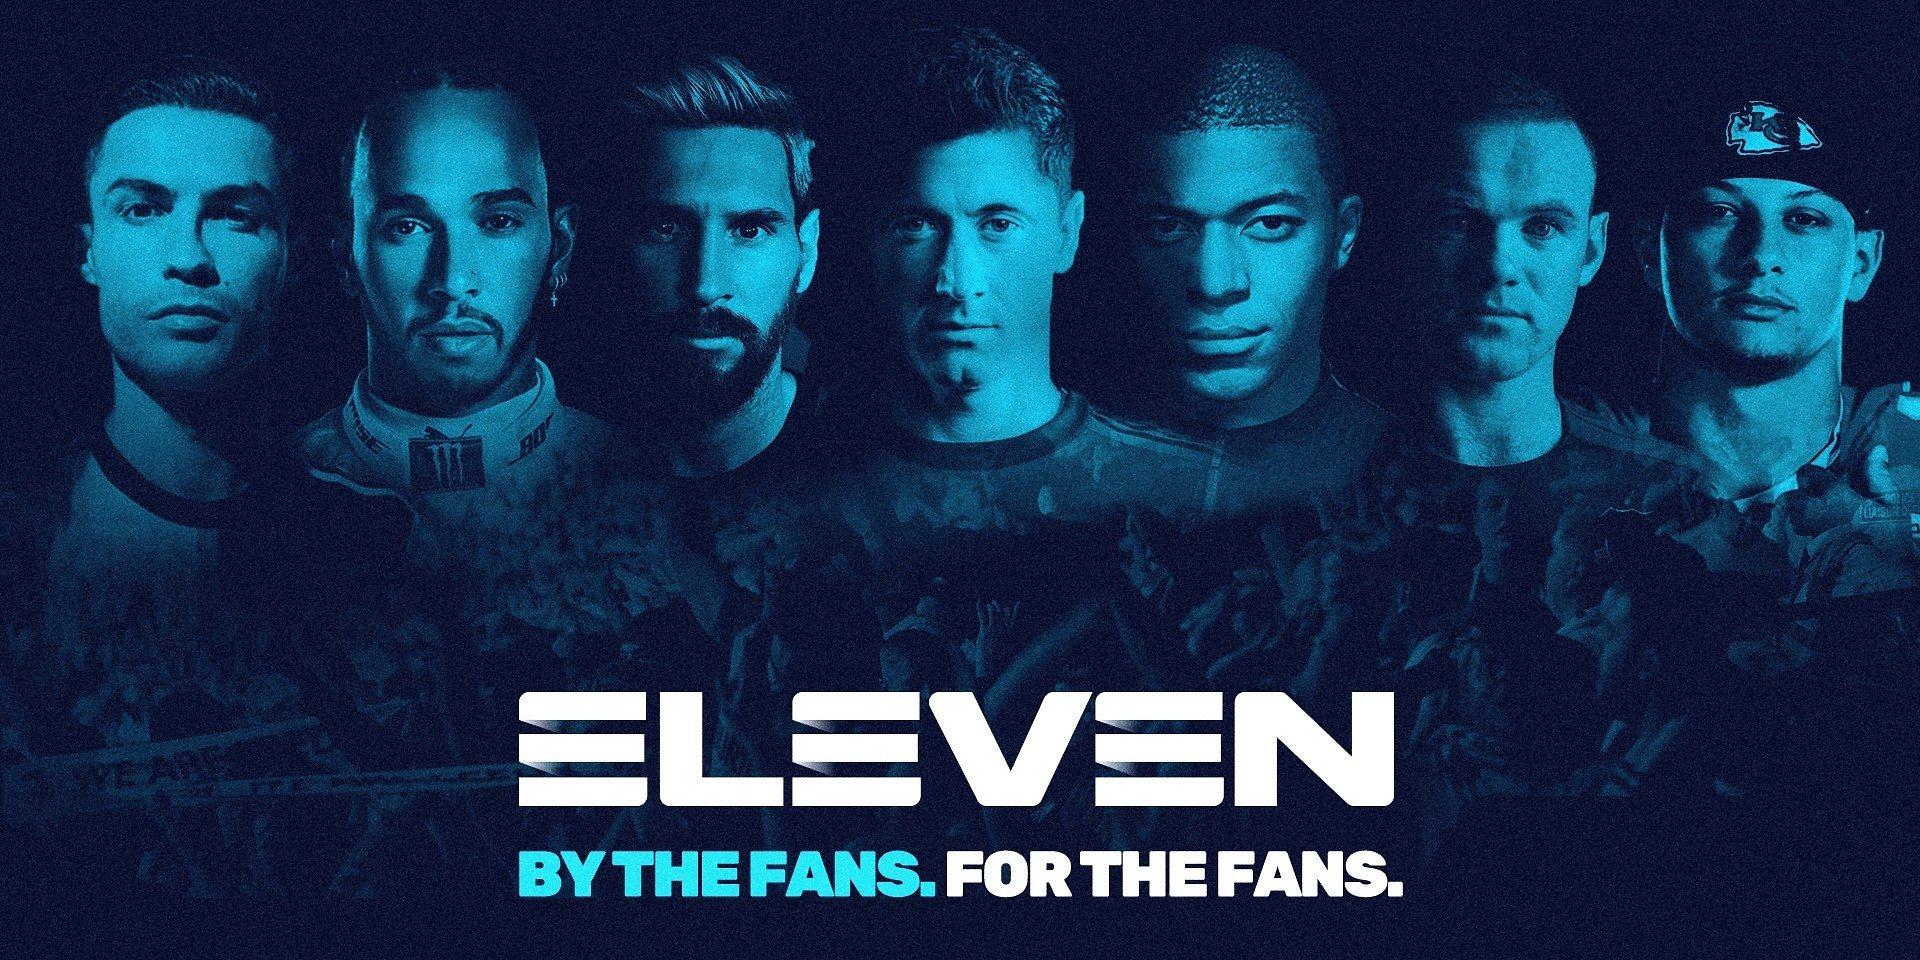 ELEVEN e UEFA celebram regresso da Champions League com passatempo